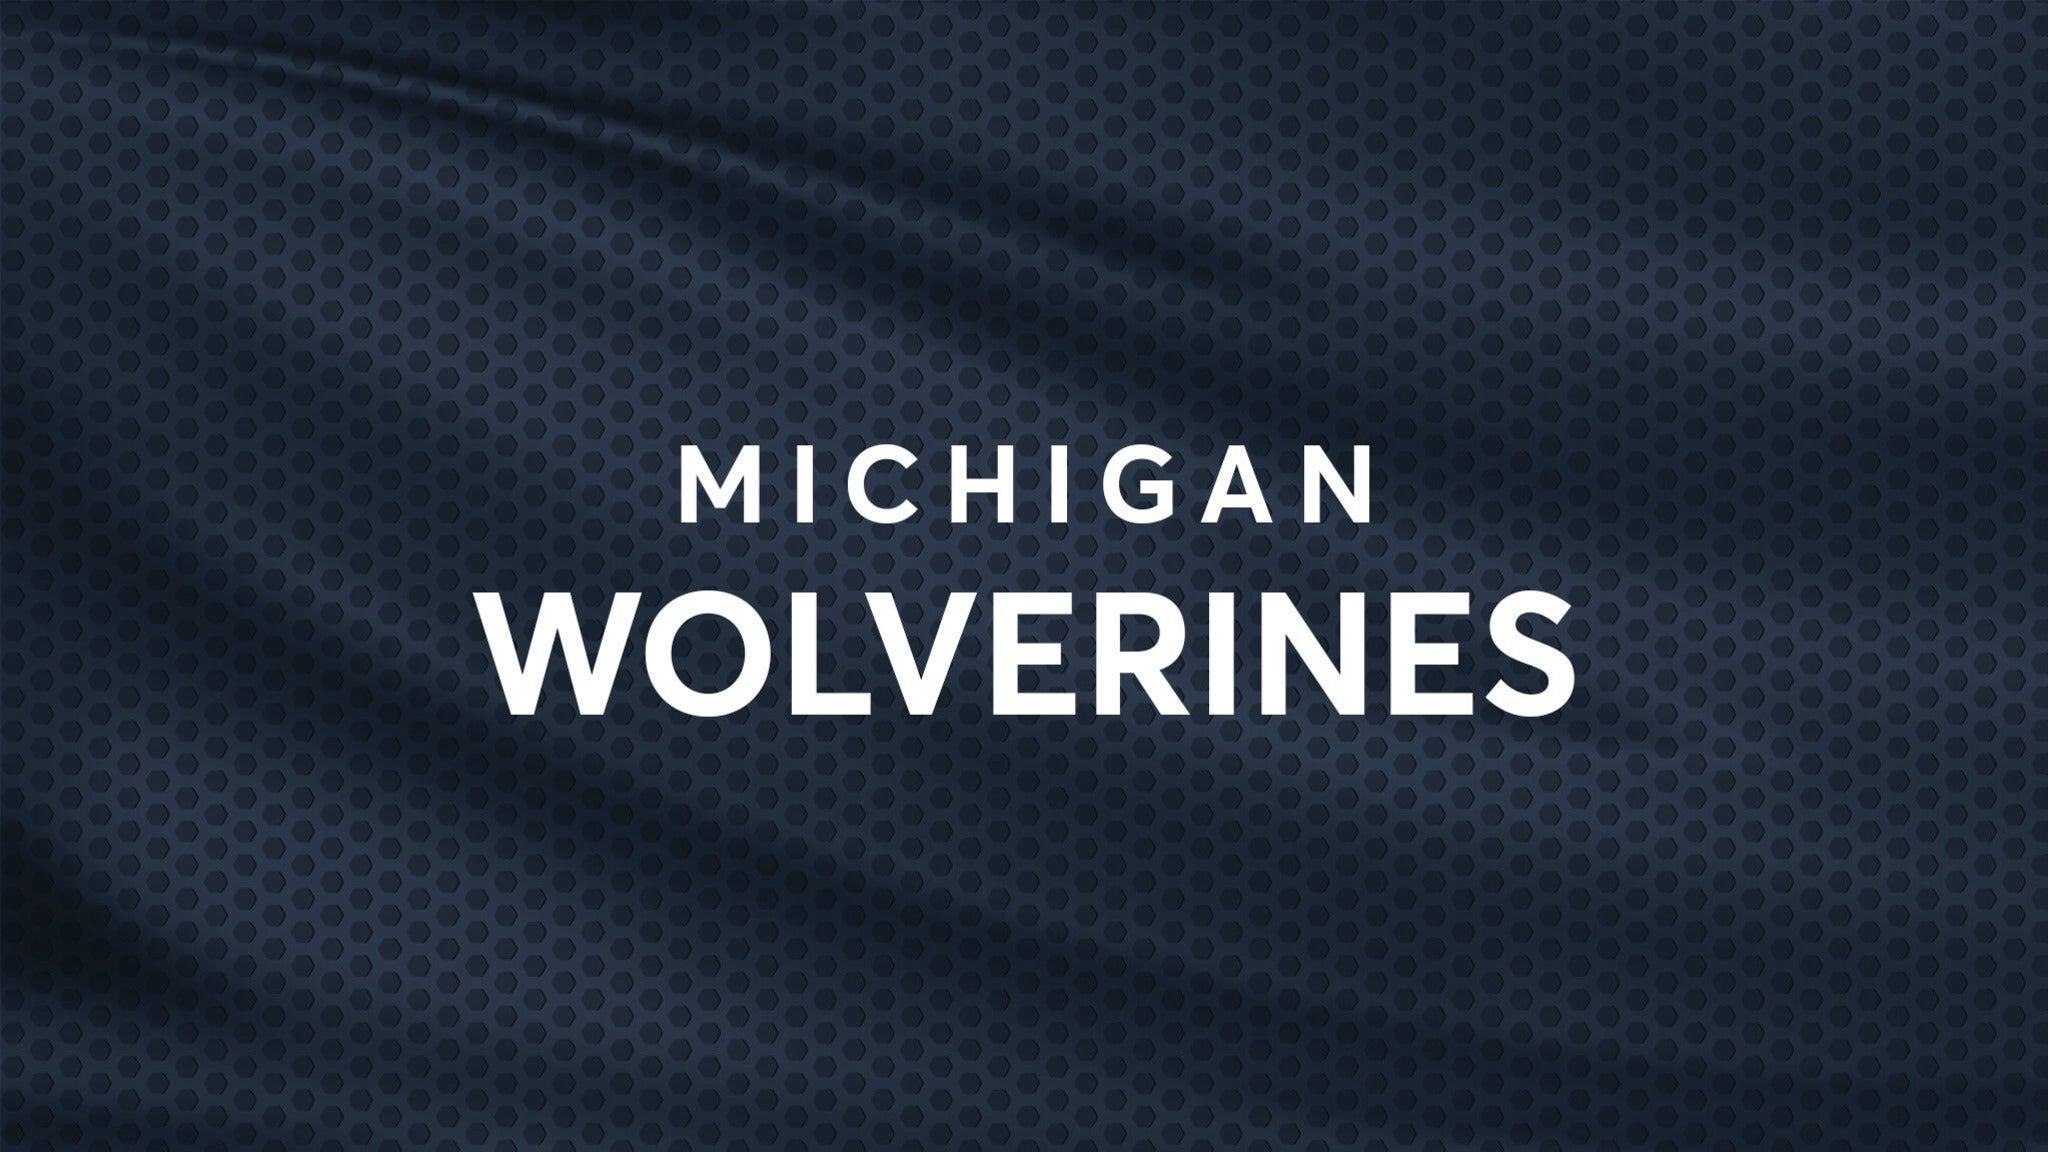 Michigan Wolverines Hockey vs. Minnesota Gophers Mens Hockey